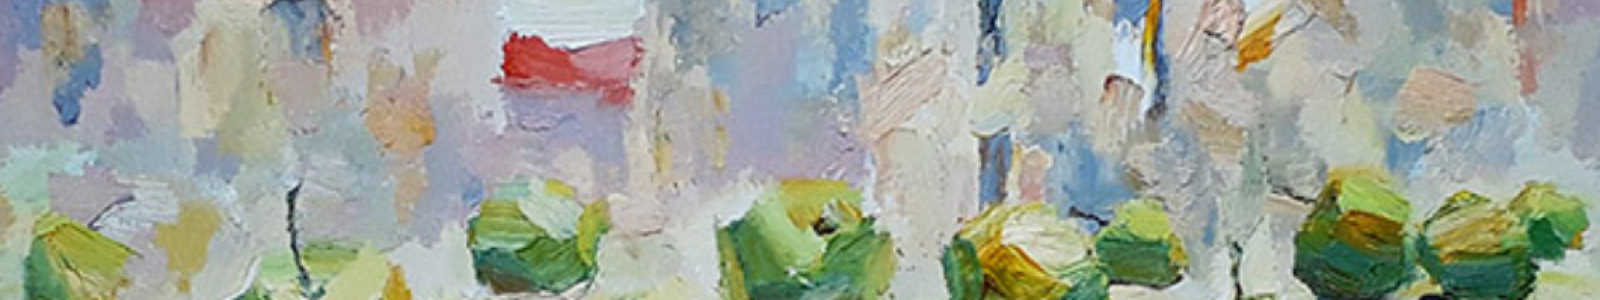 Gallery Painter sergei balenok